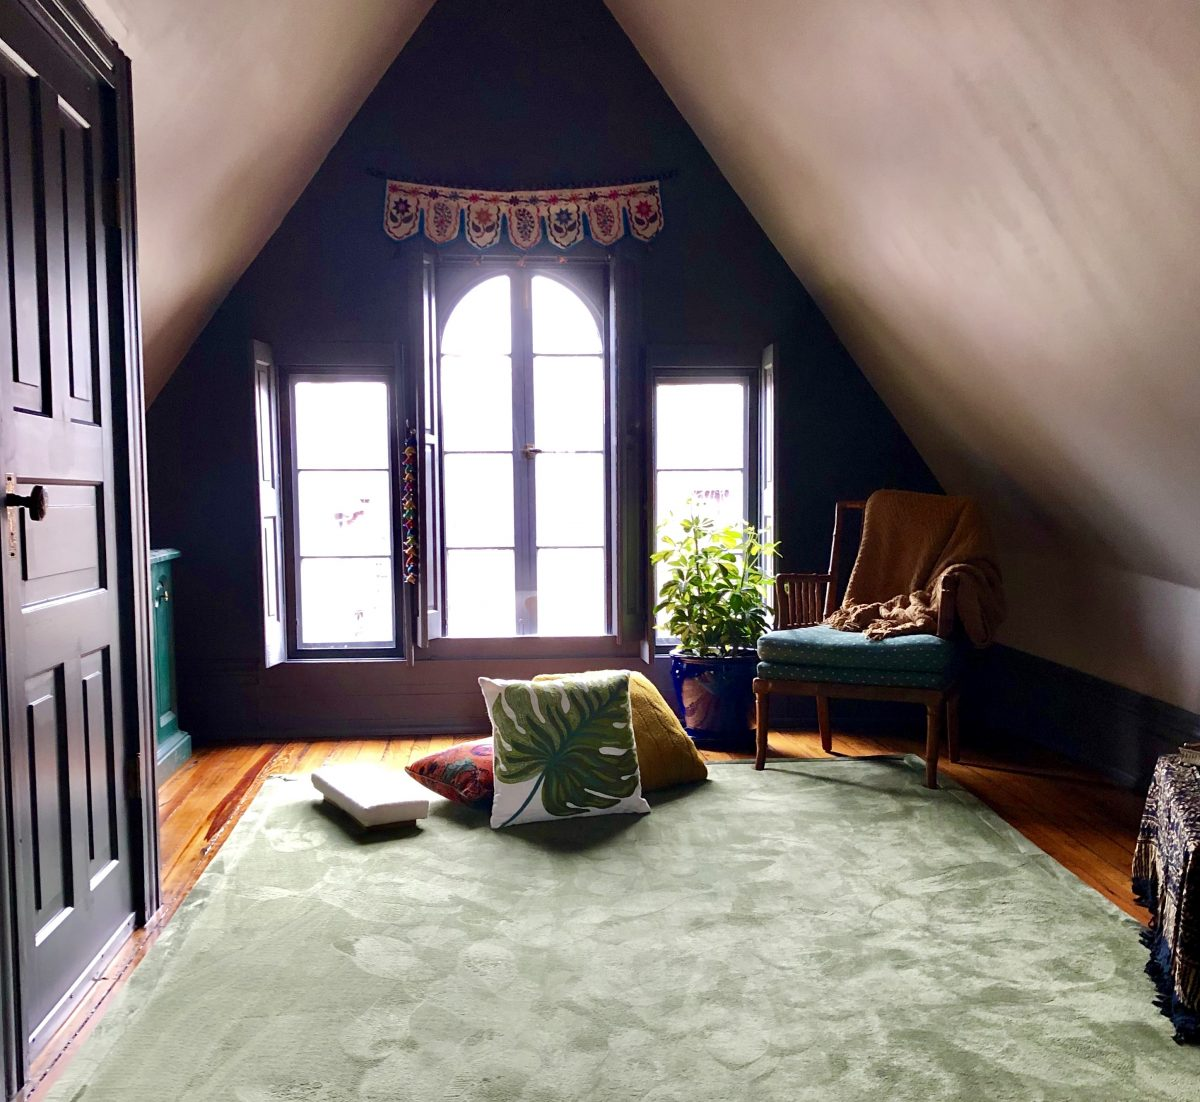 How to Design a Meditation Room - Indow Windows